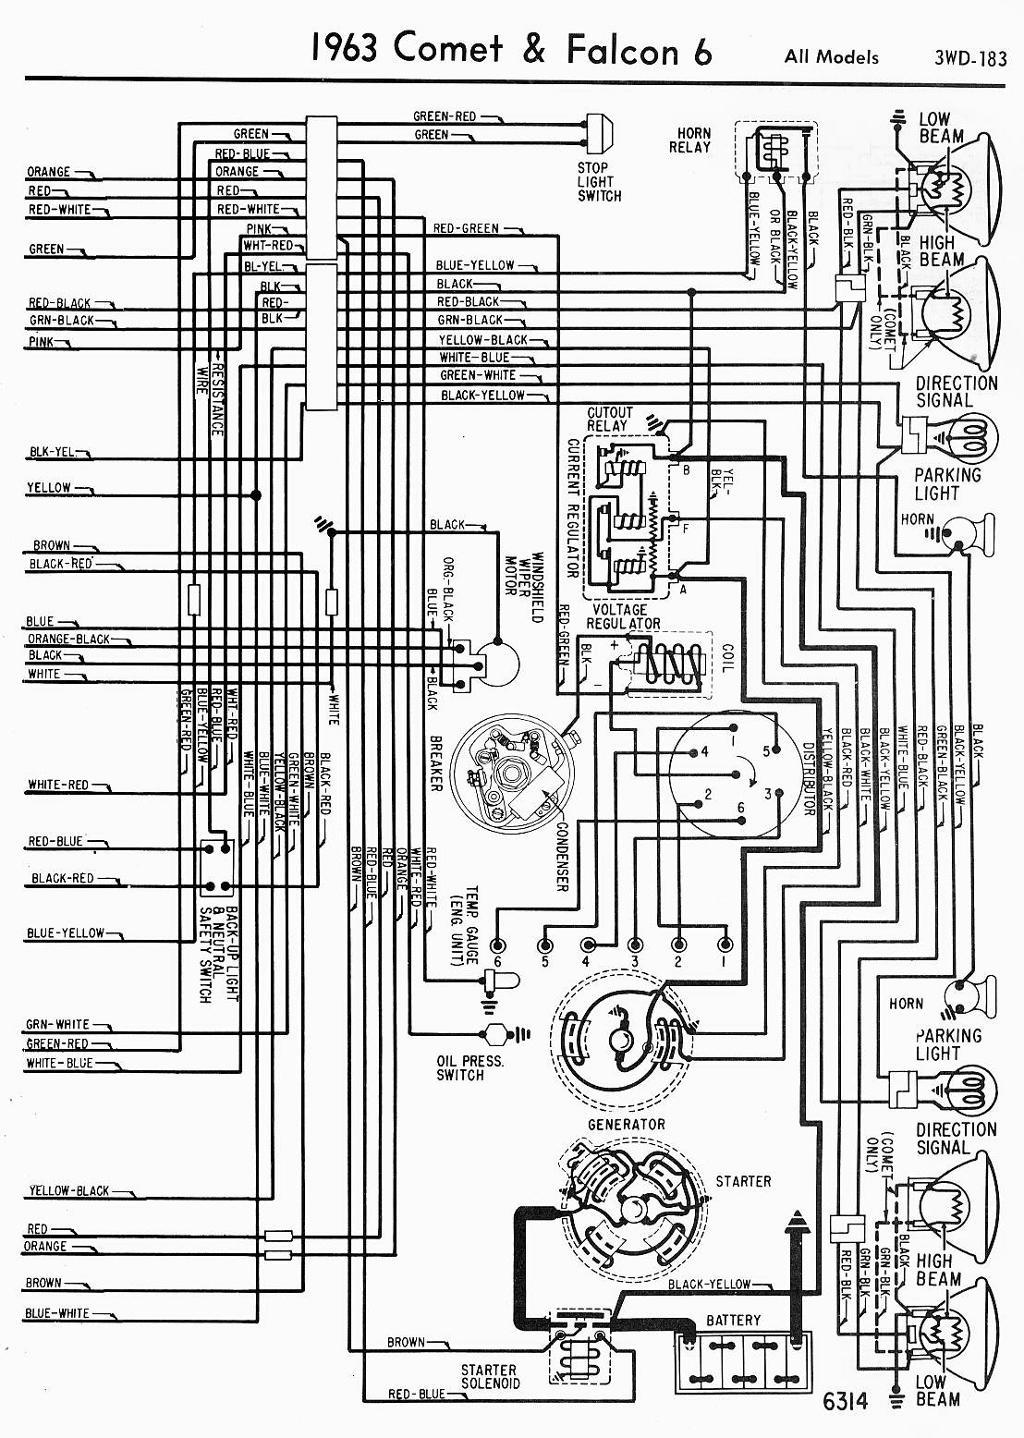 1963 Fairlane Wiring Diagram - Wiring Diagrams DataUssel